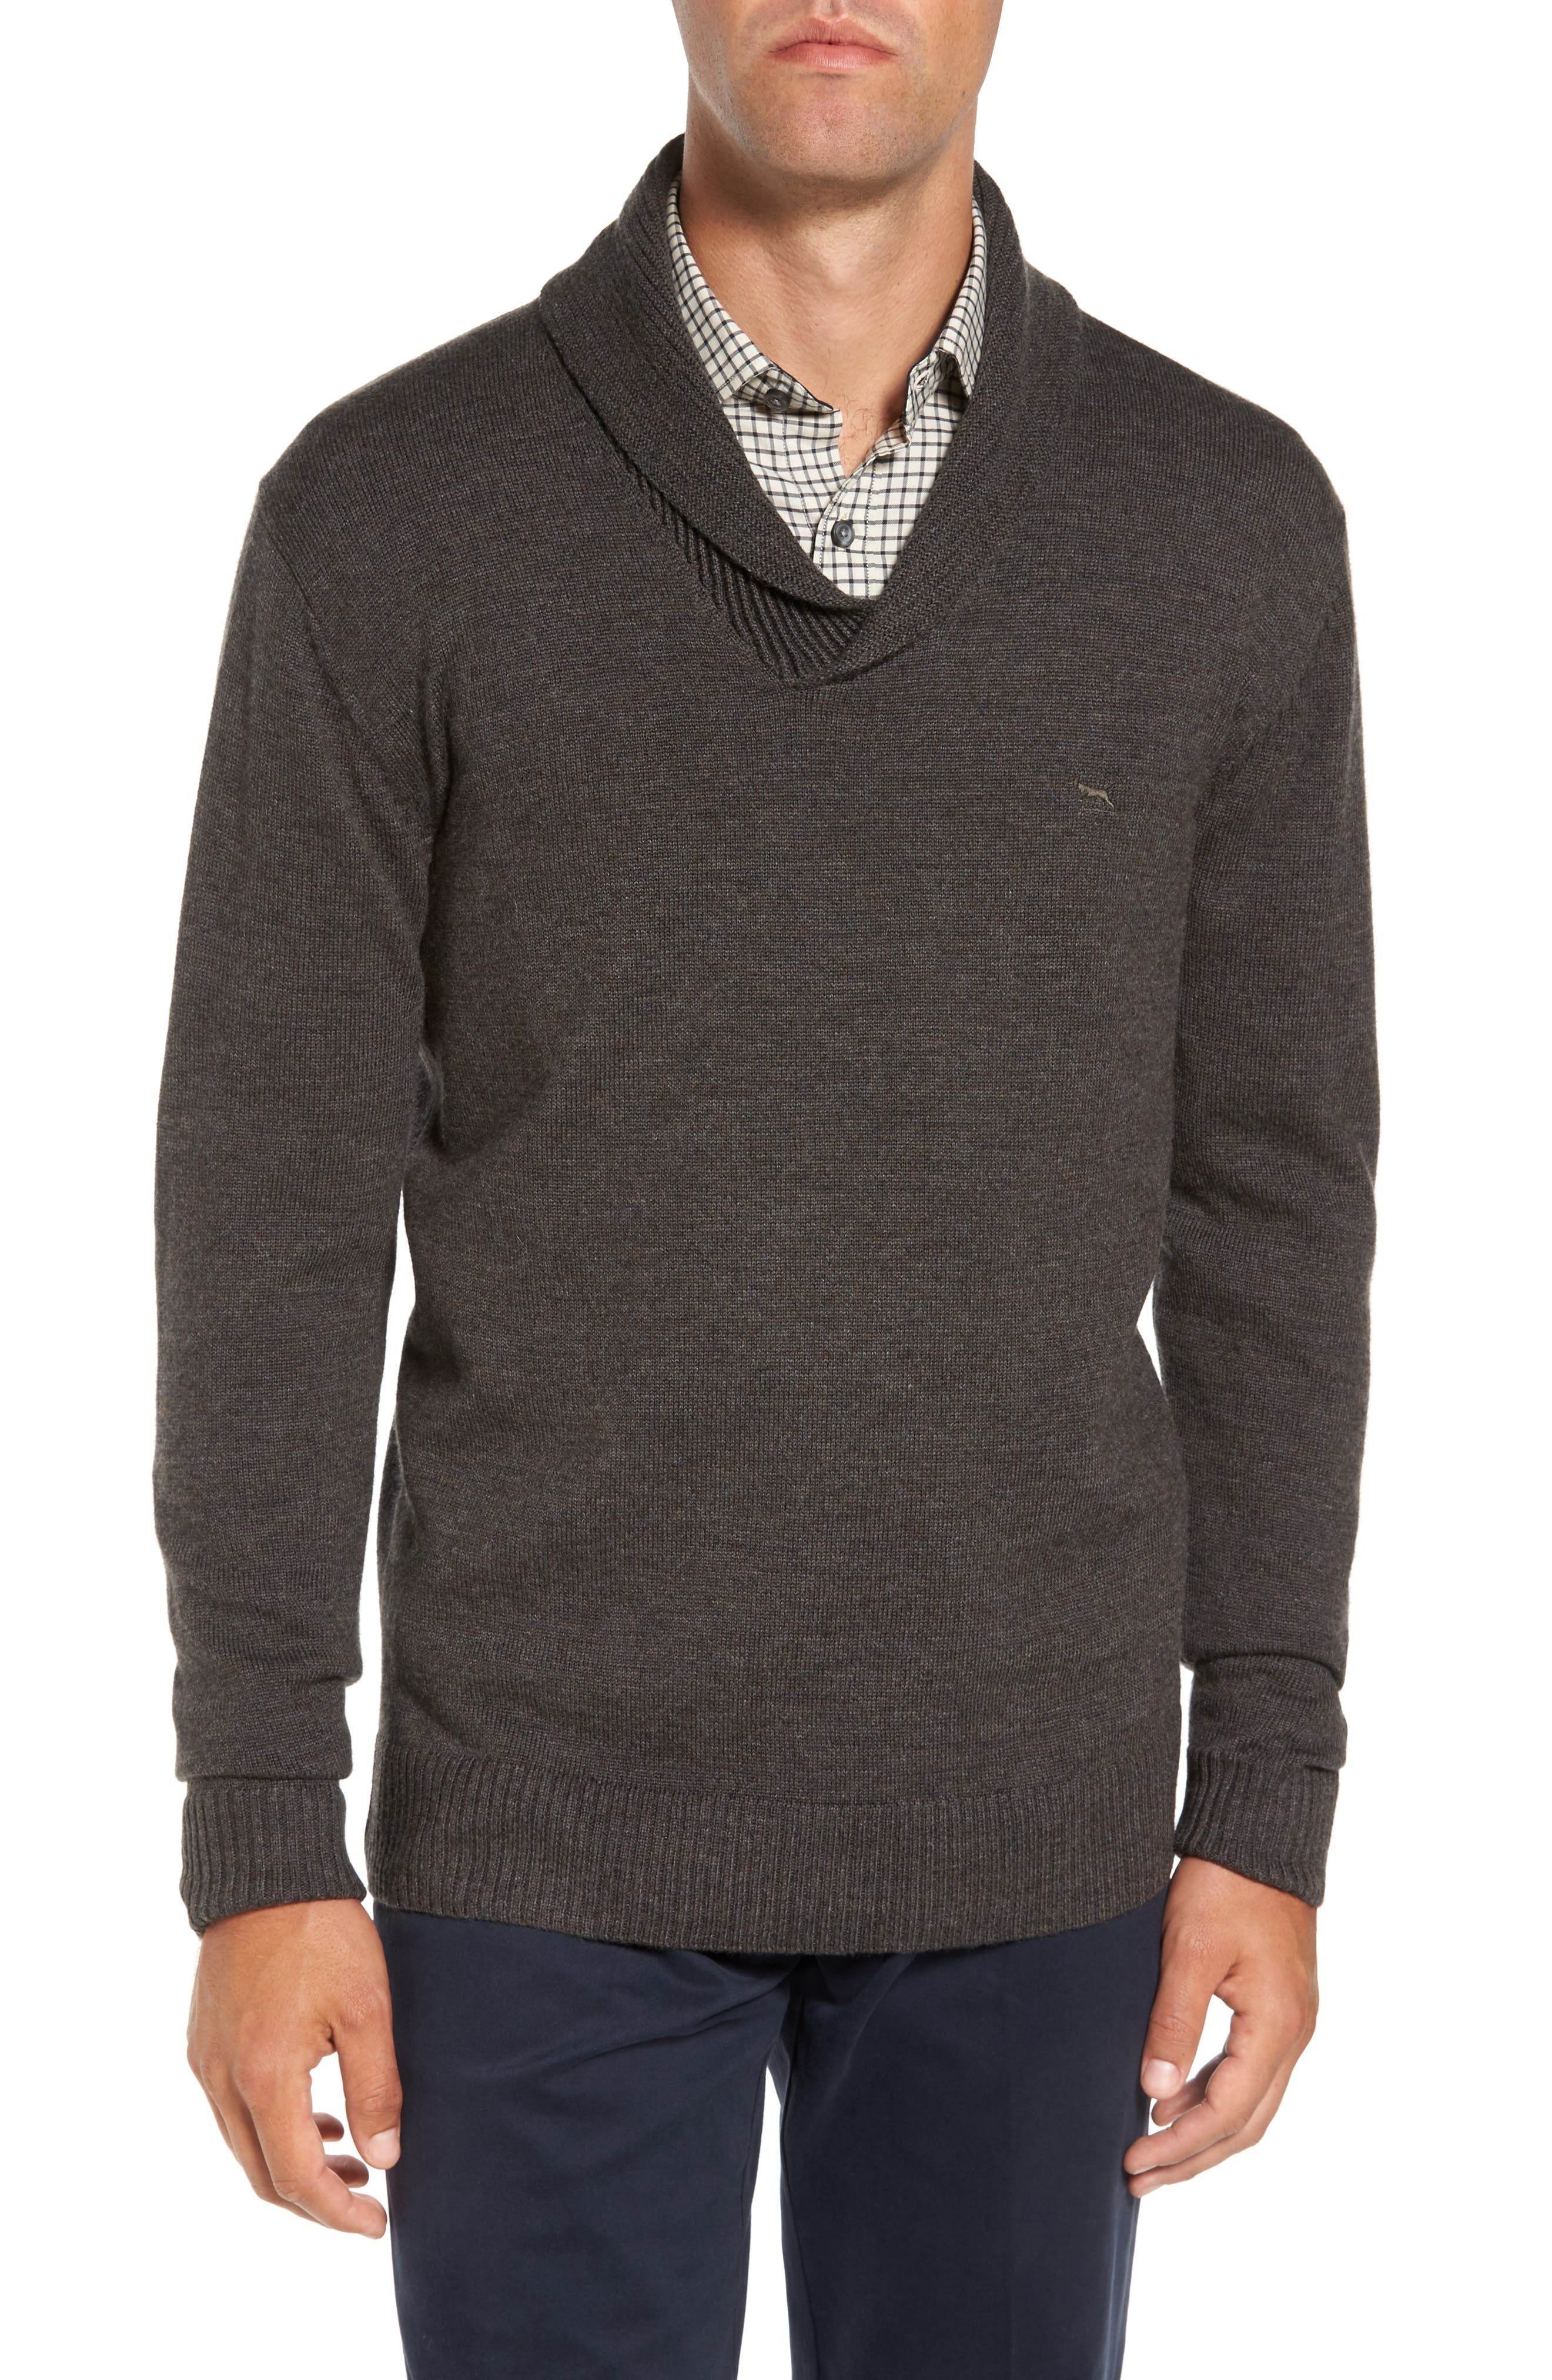 Alternate Image 1 Selected - Rodd & Gunn PT Chevalier Shawl Collar Sweater